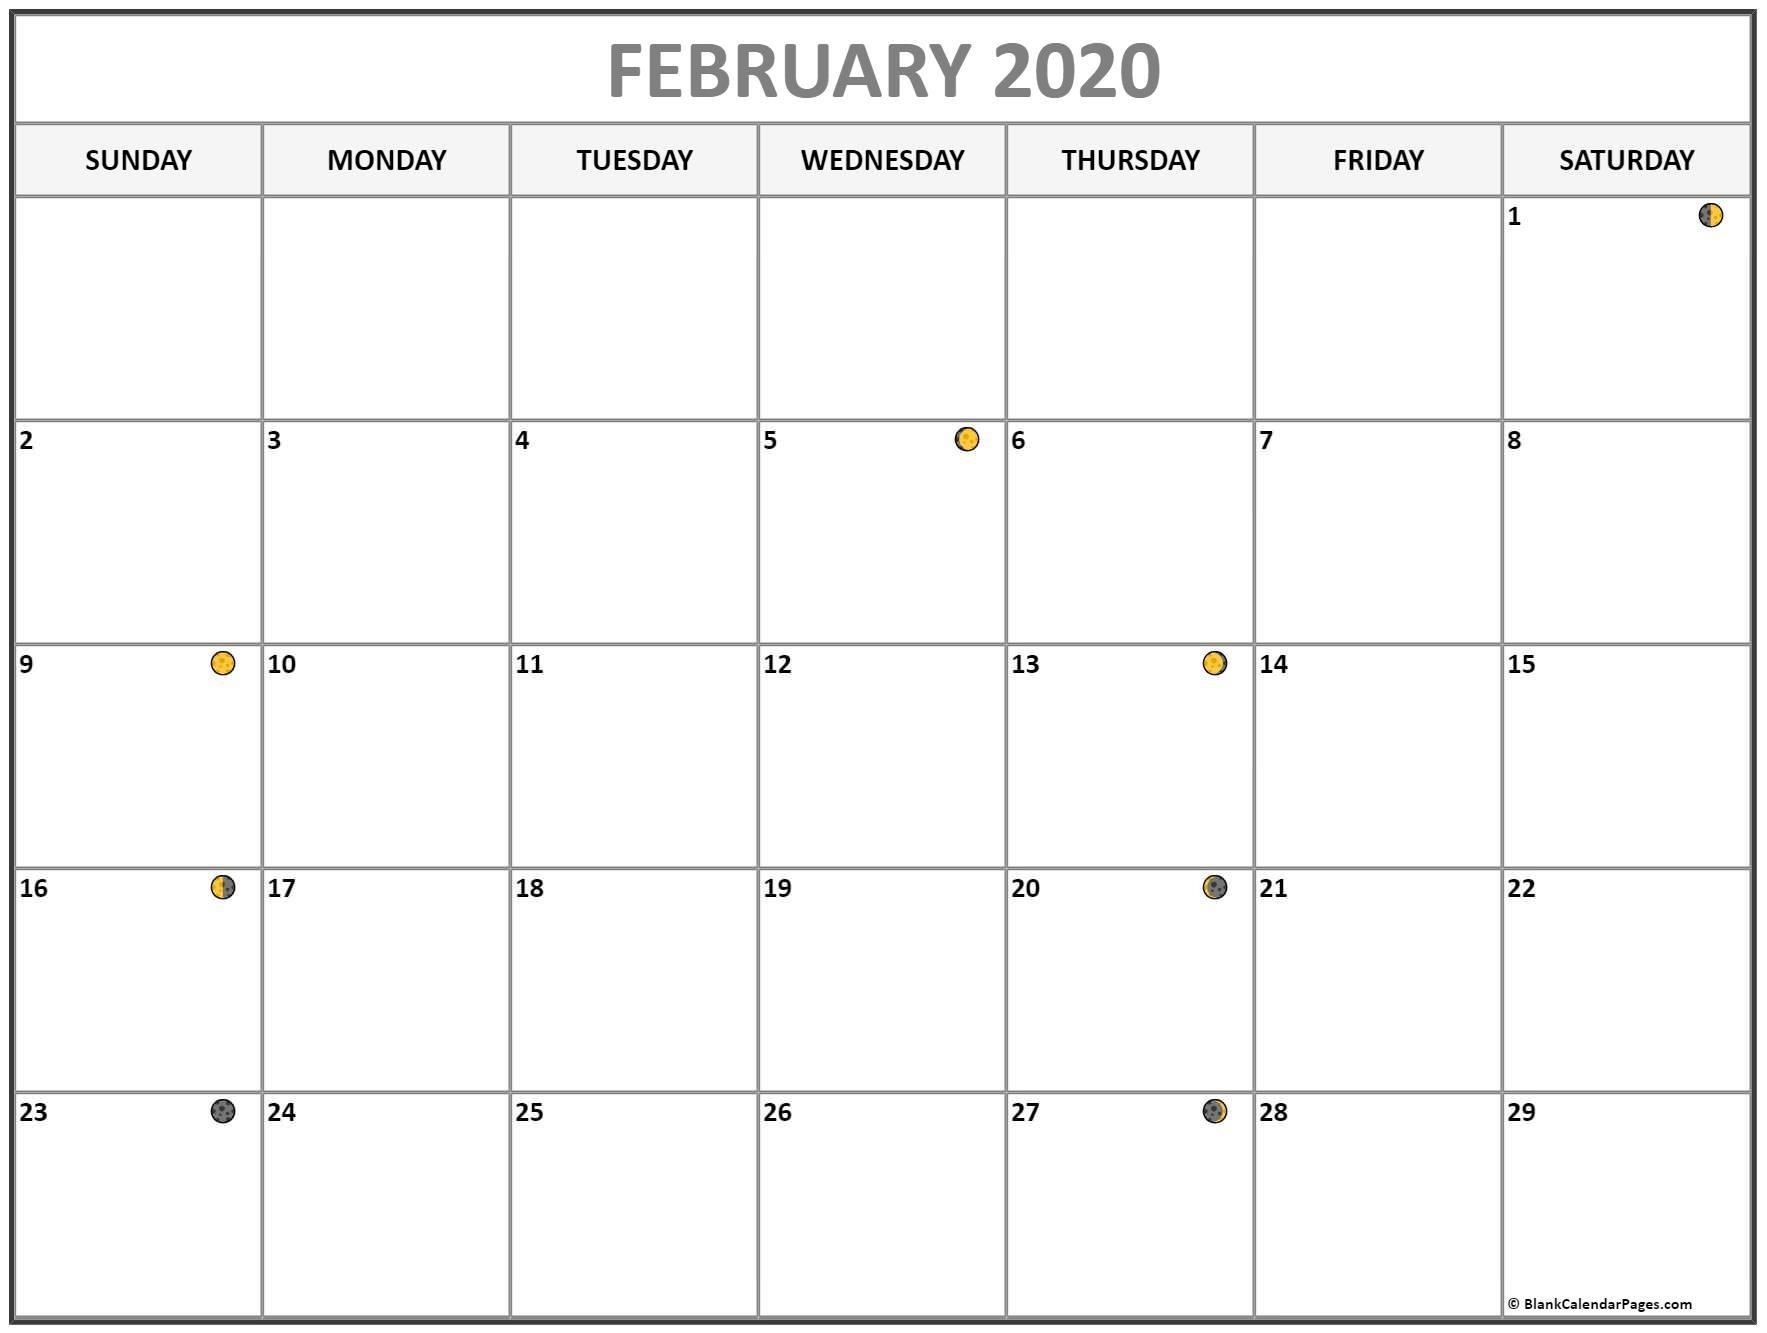 February 2020 Lunar Calendar   Moon Phase Calendar  Solar Lunar Calendar - 2020